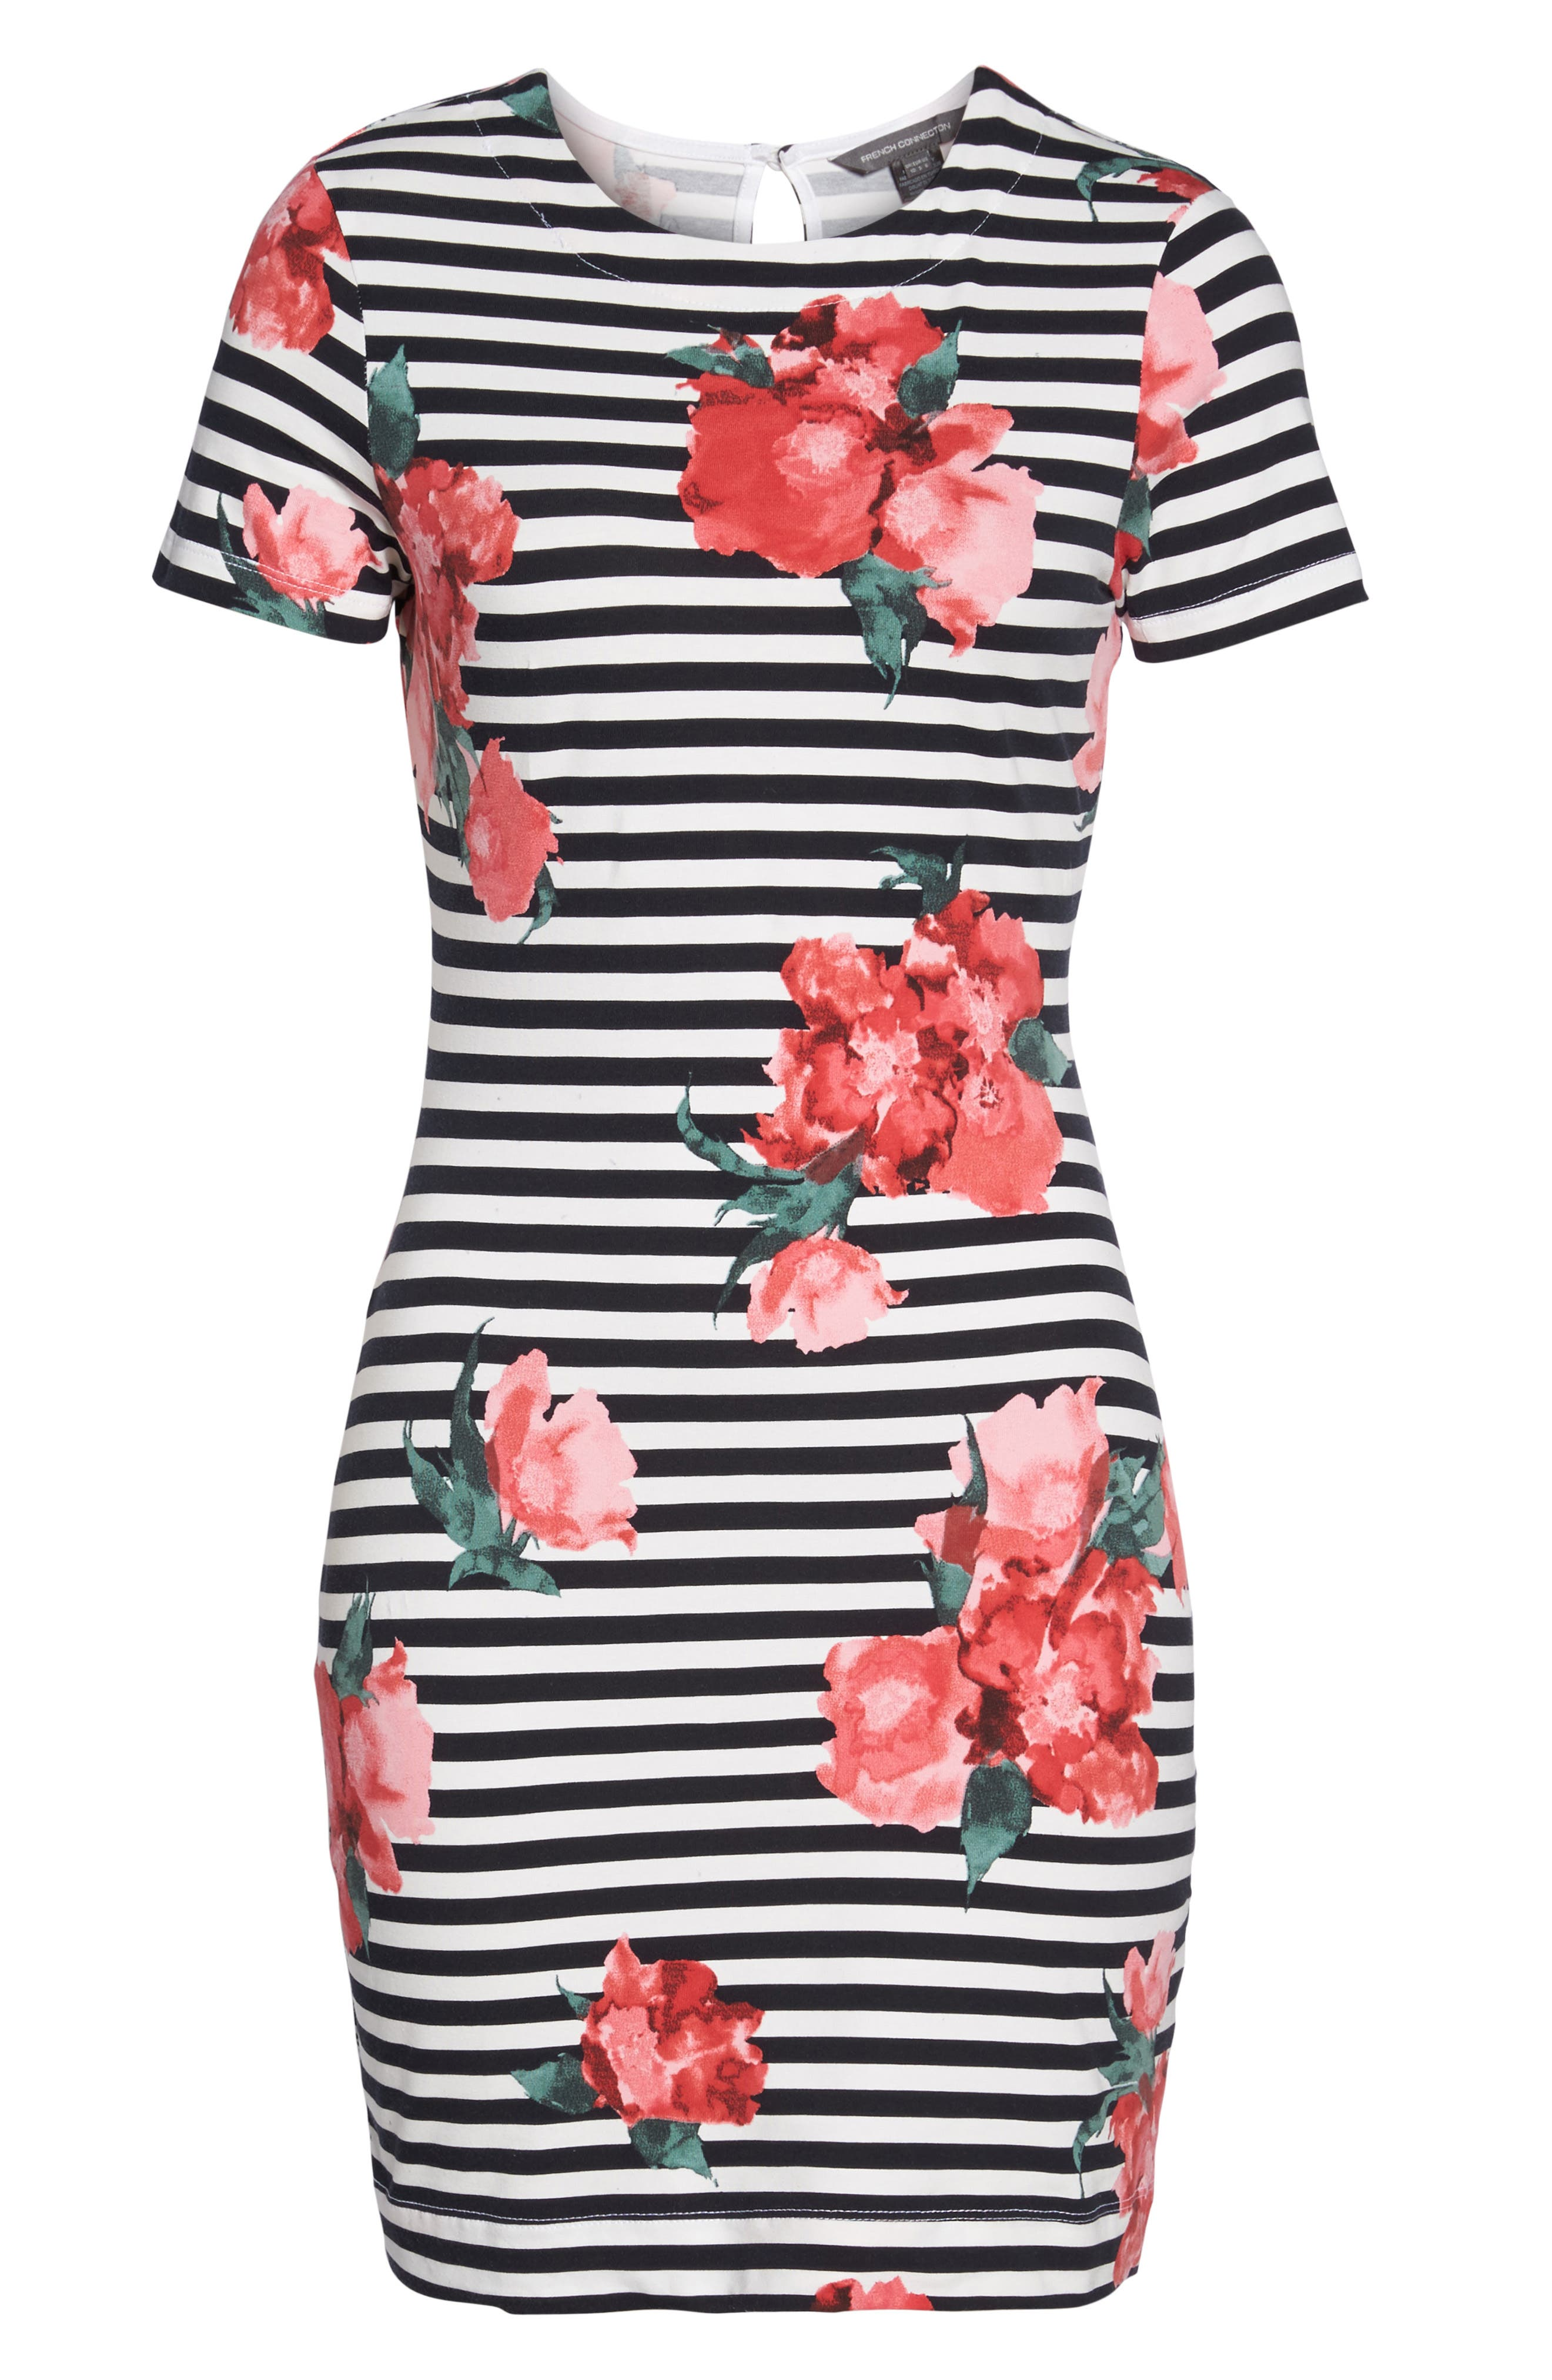 Jude Flower Stripe Knit Dress,                             Alternate thumbnail 6, color,                             Nocturnal Multi